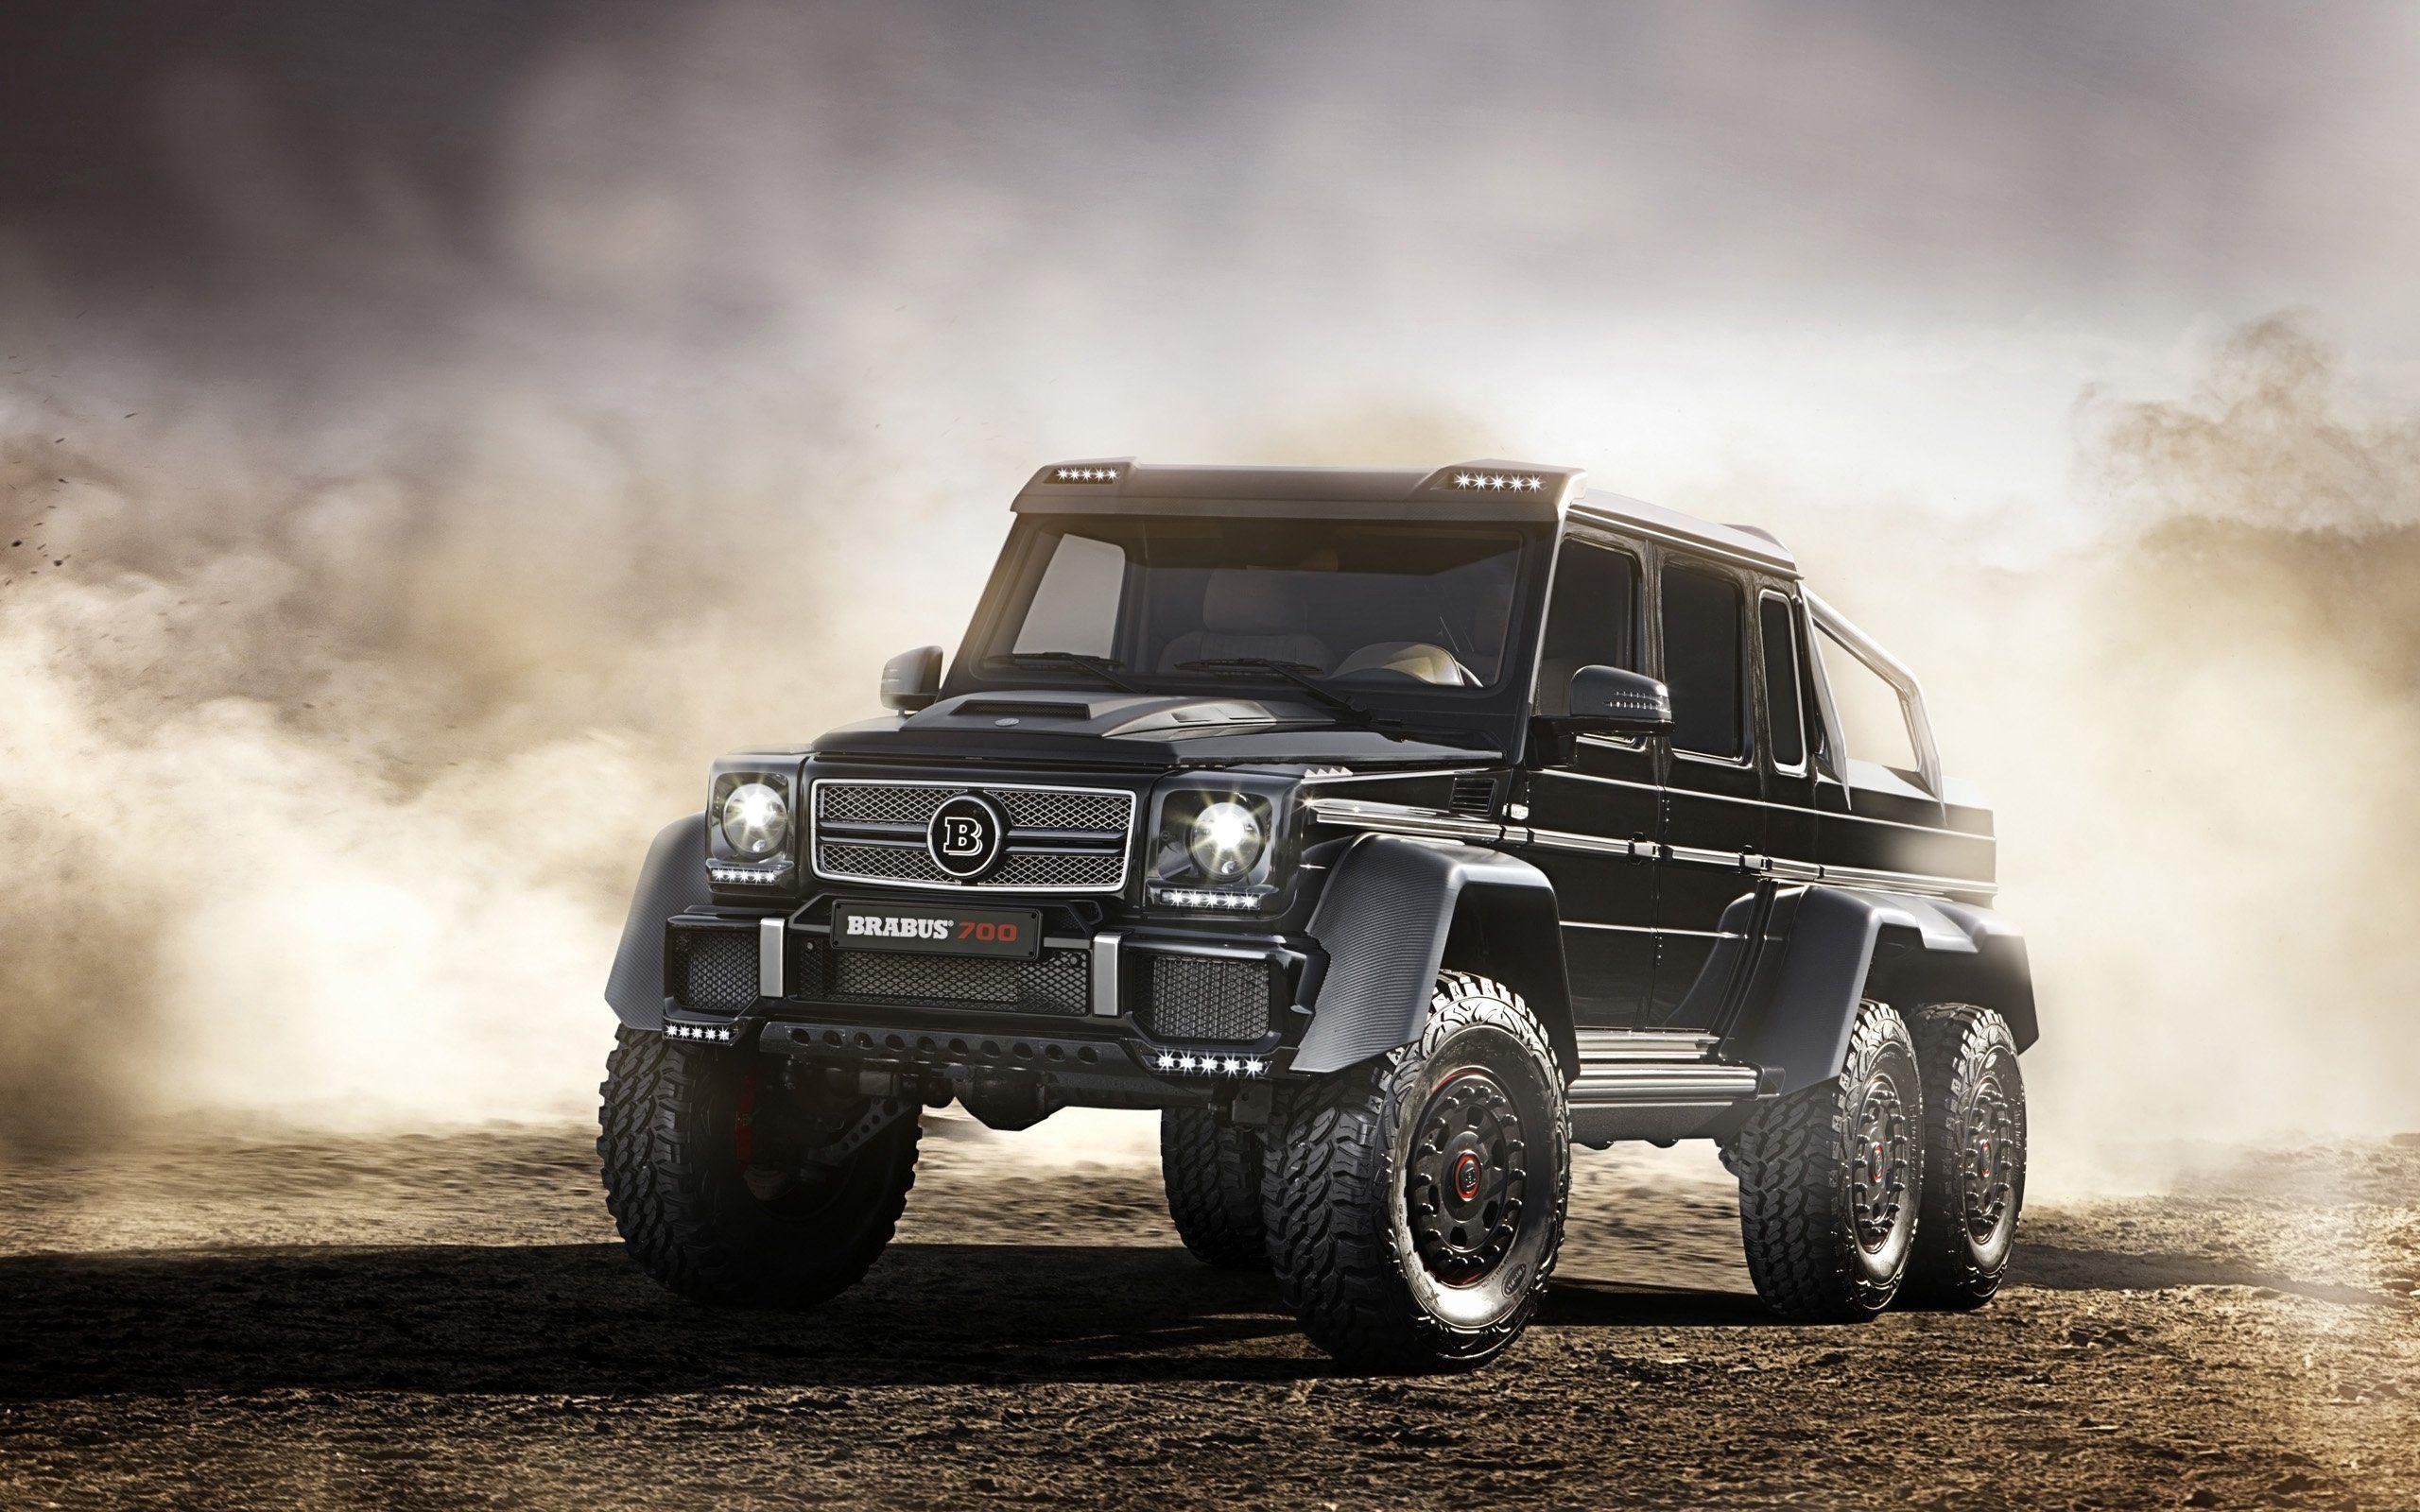 2014 Brabus Mercedes Benz B63s 700 6x6 Pickup Suv Tuning Offroad G